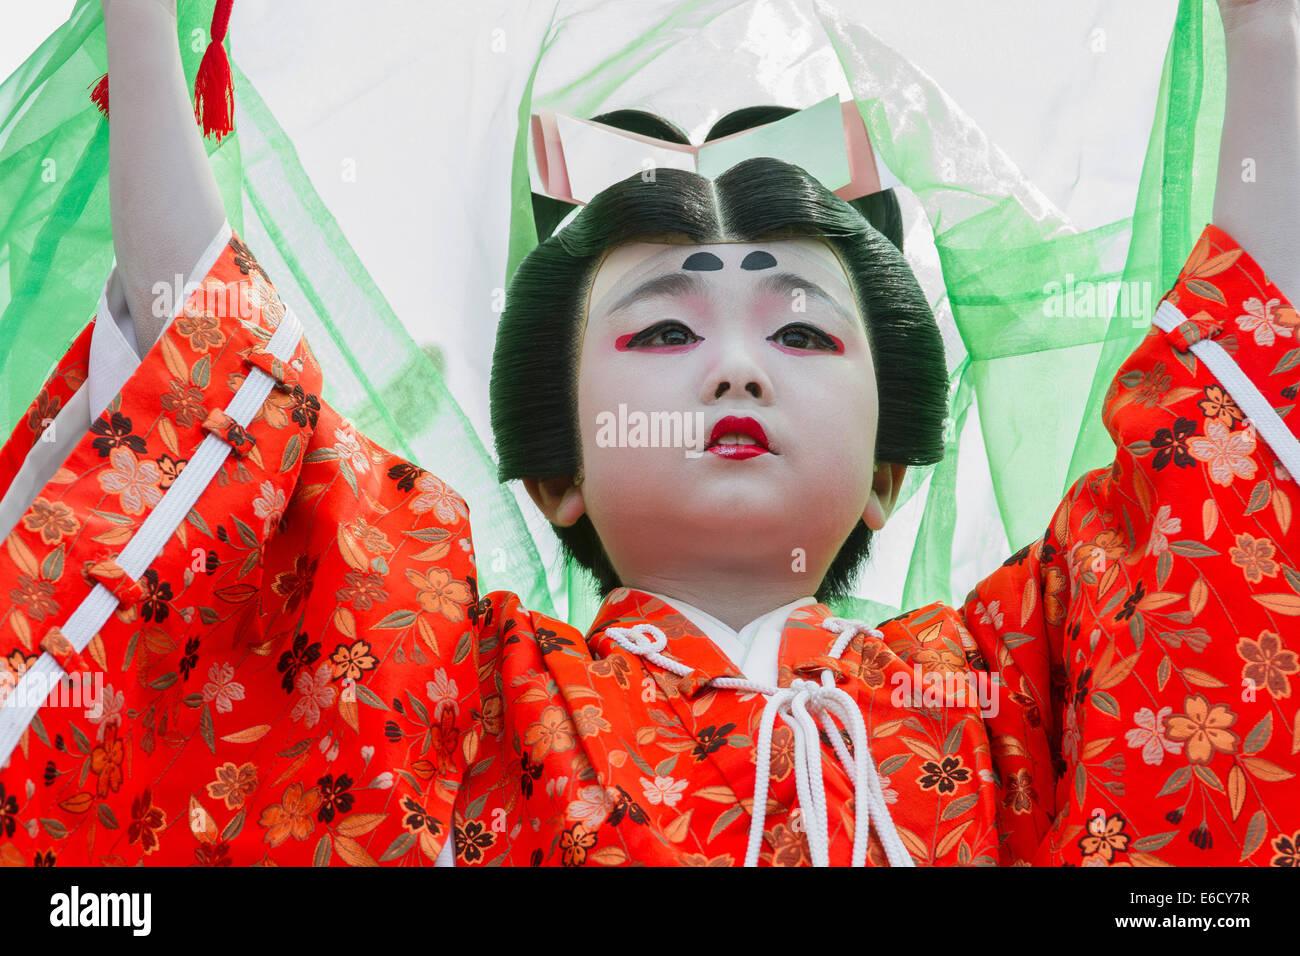 Child in costume in a Kabuki performance at Furukawa Festival, Hida-Furukawa, Japan. - Stock Image